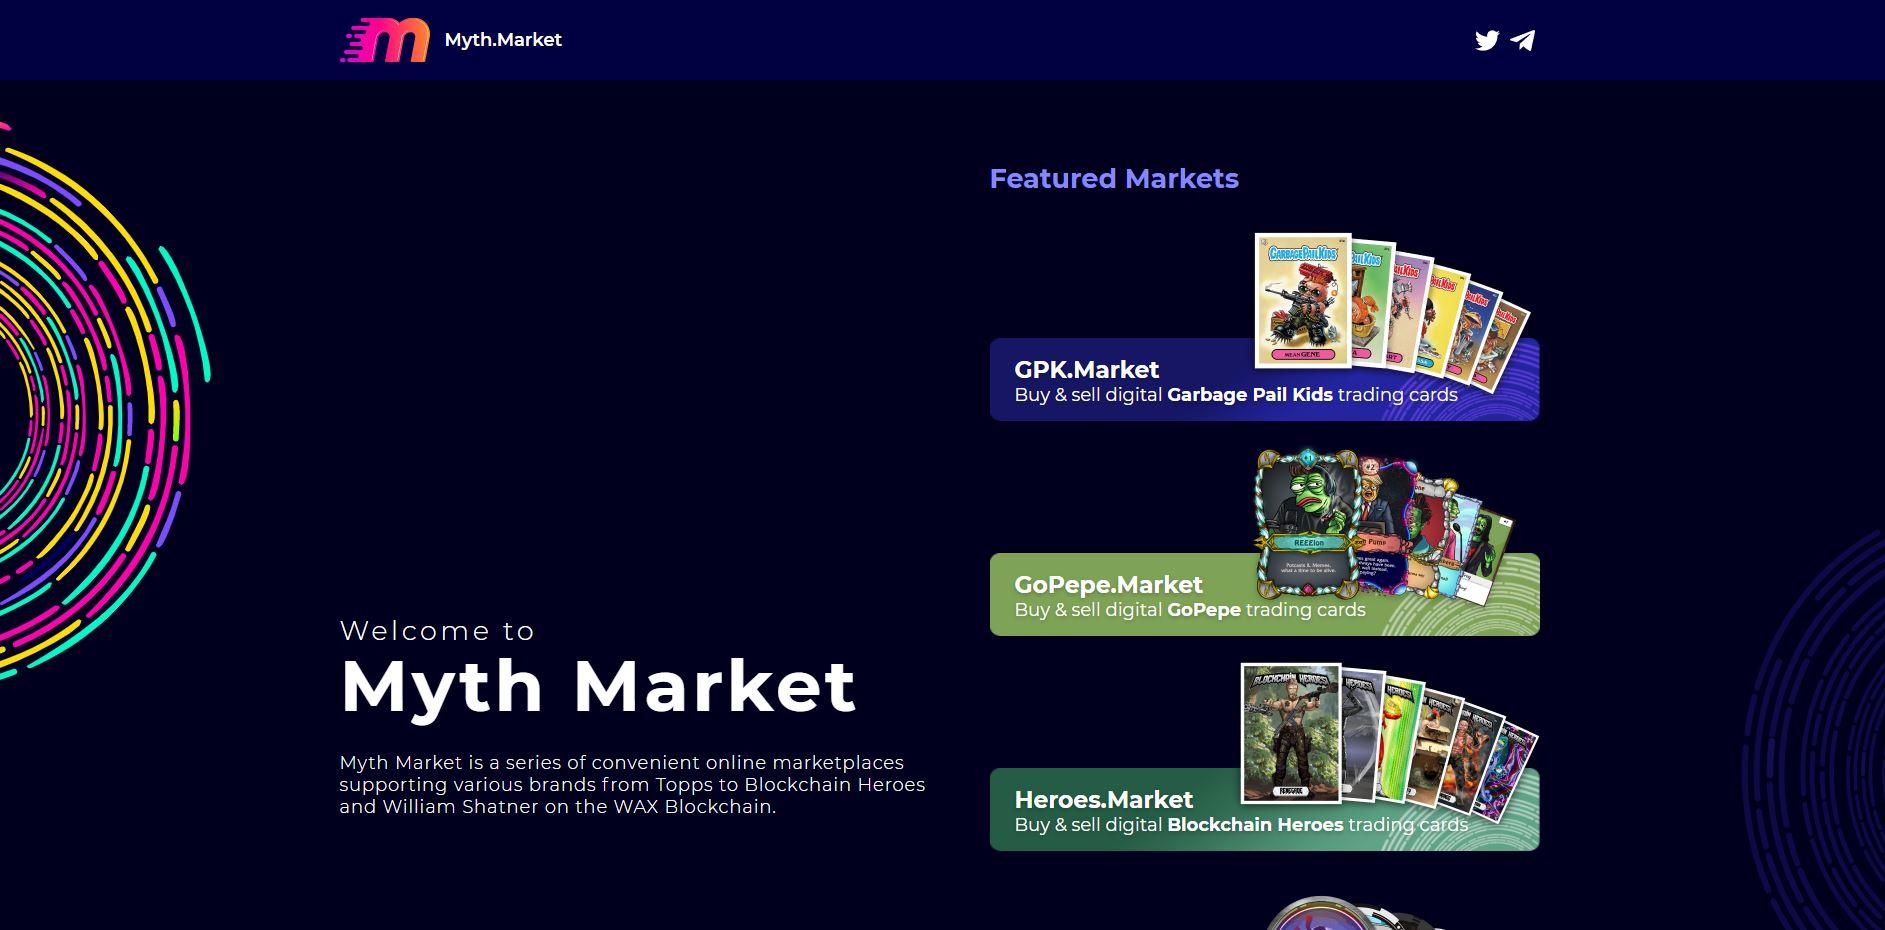 myth market interface